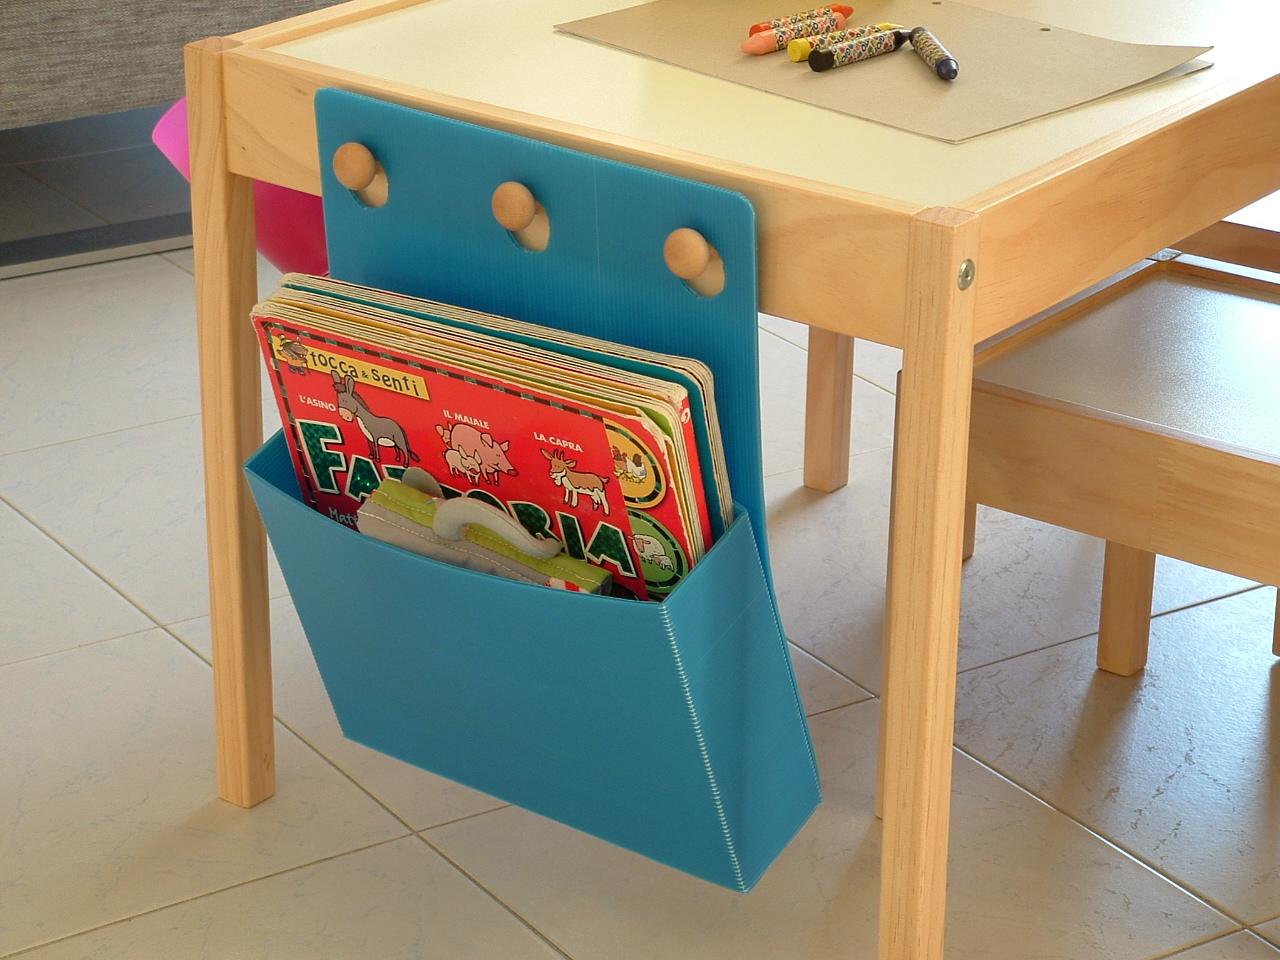 Ricicla e crea tavolino ikea per flavia - Ikea seggioloni per bambini ...